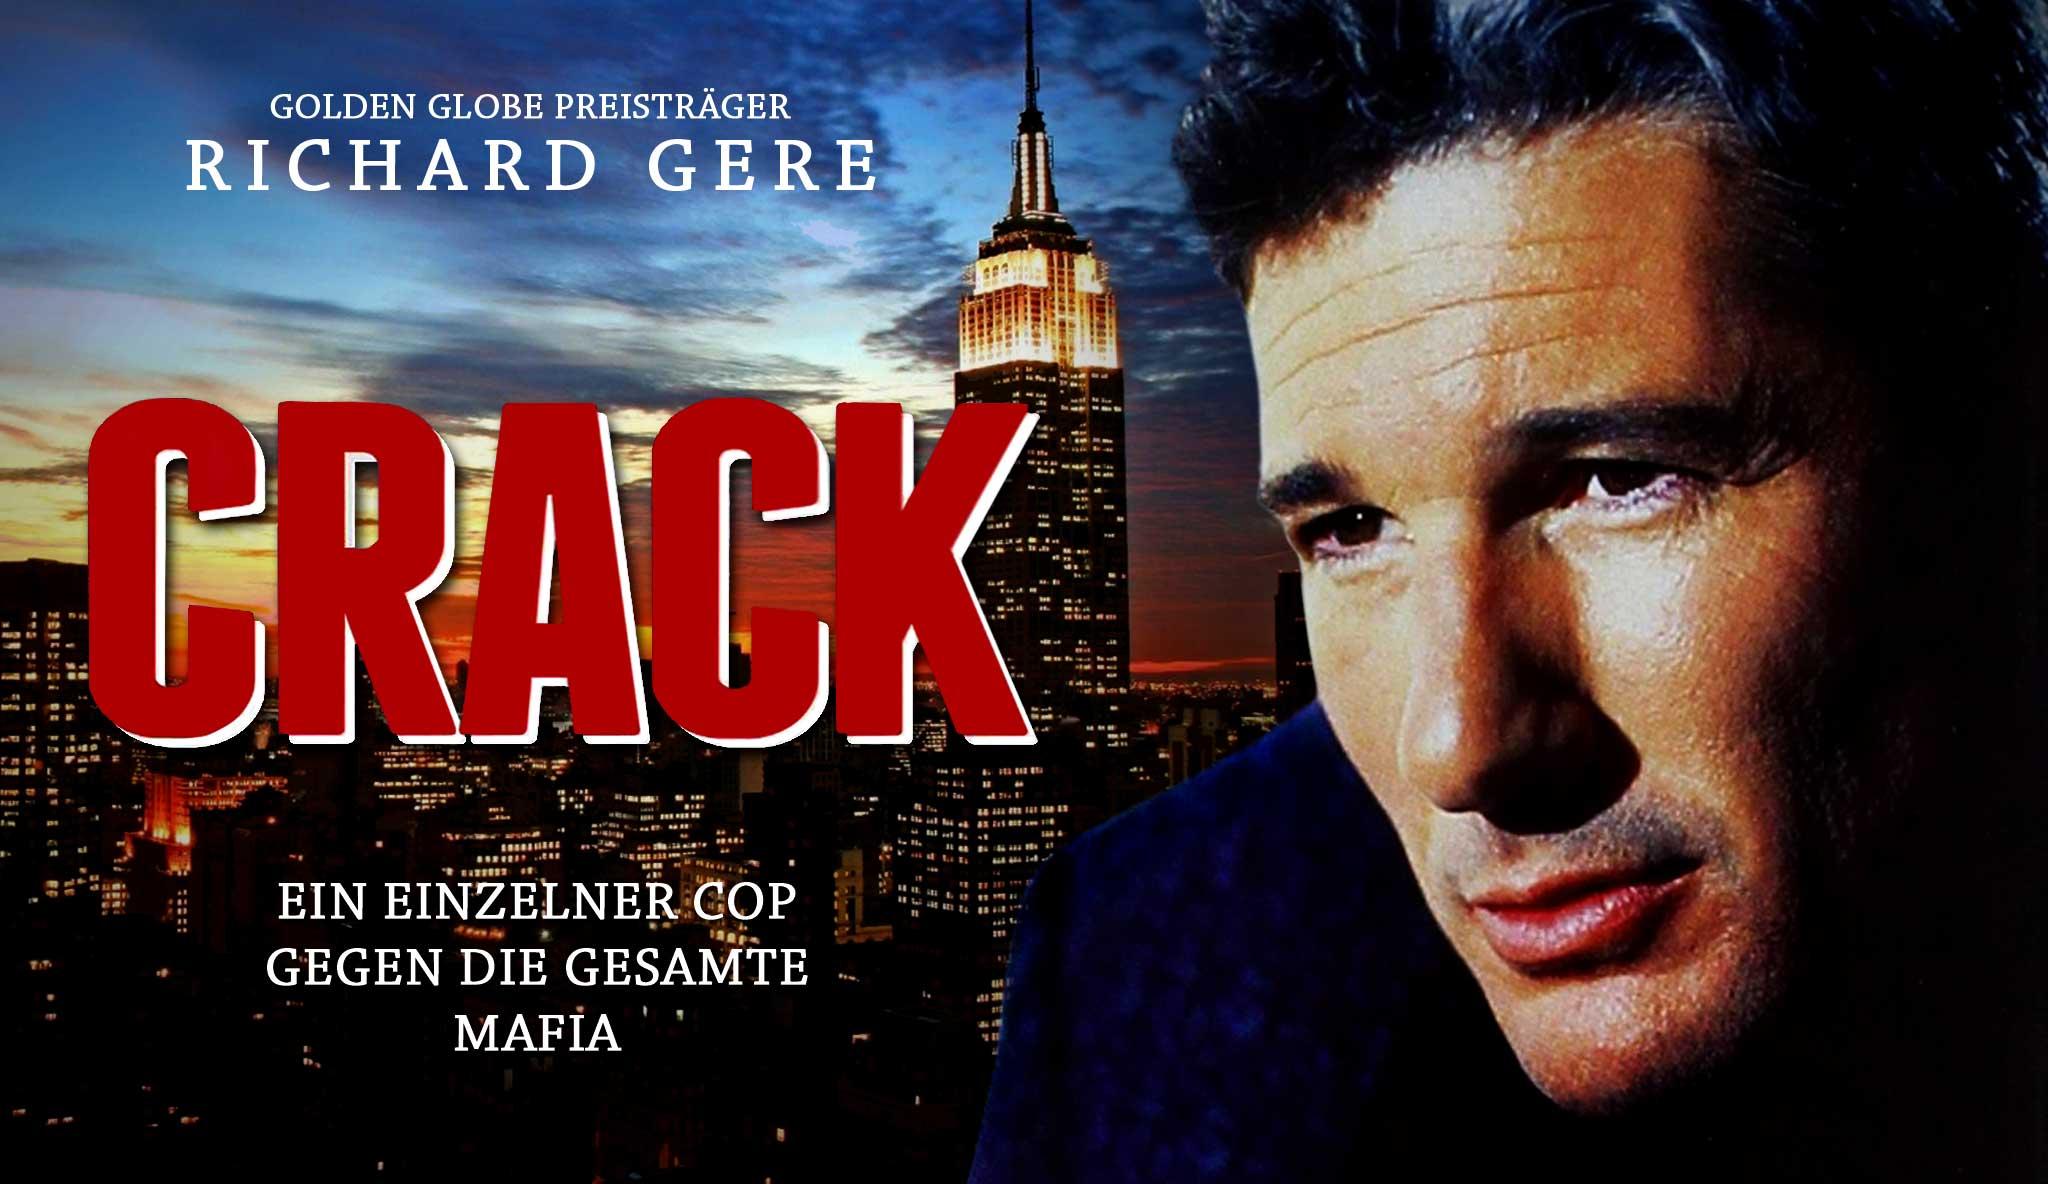 crack-richard-gere\header.jpg